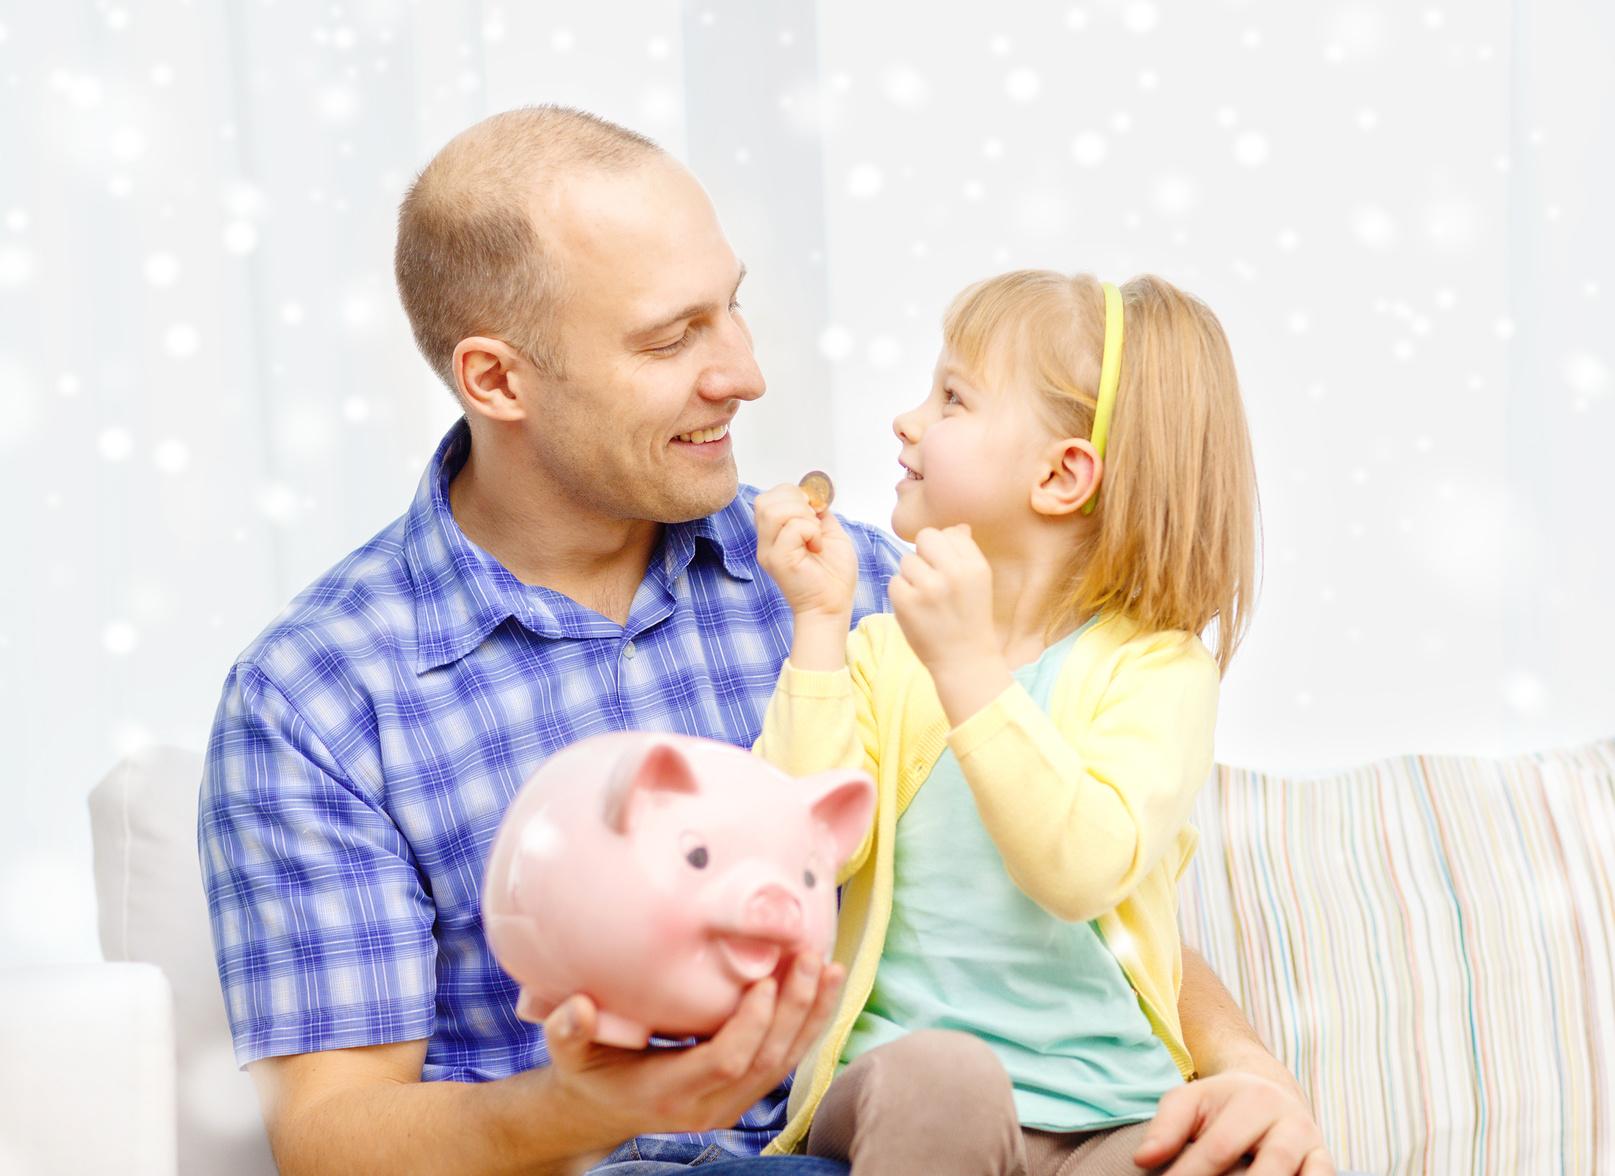 ojciec, córka, edukacja finansowa dziecka, świnka skarbonka